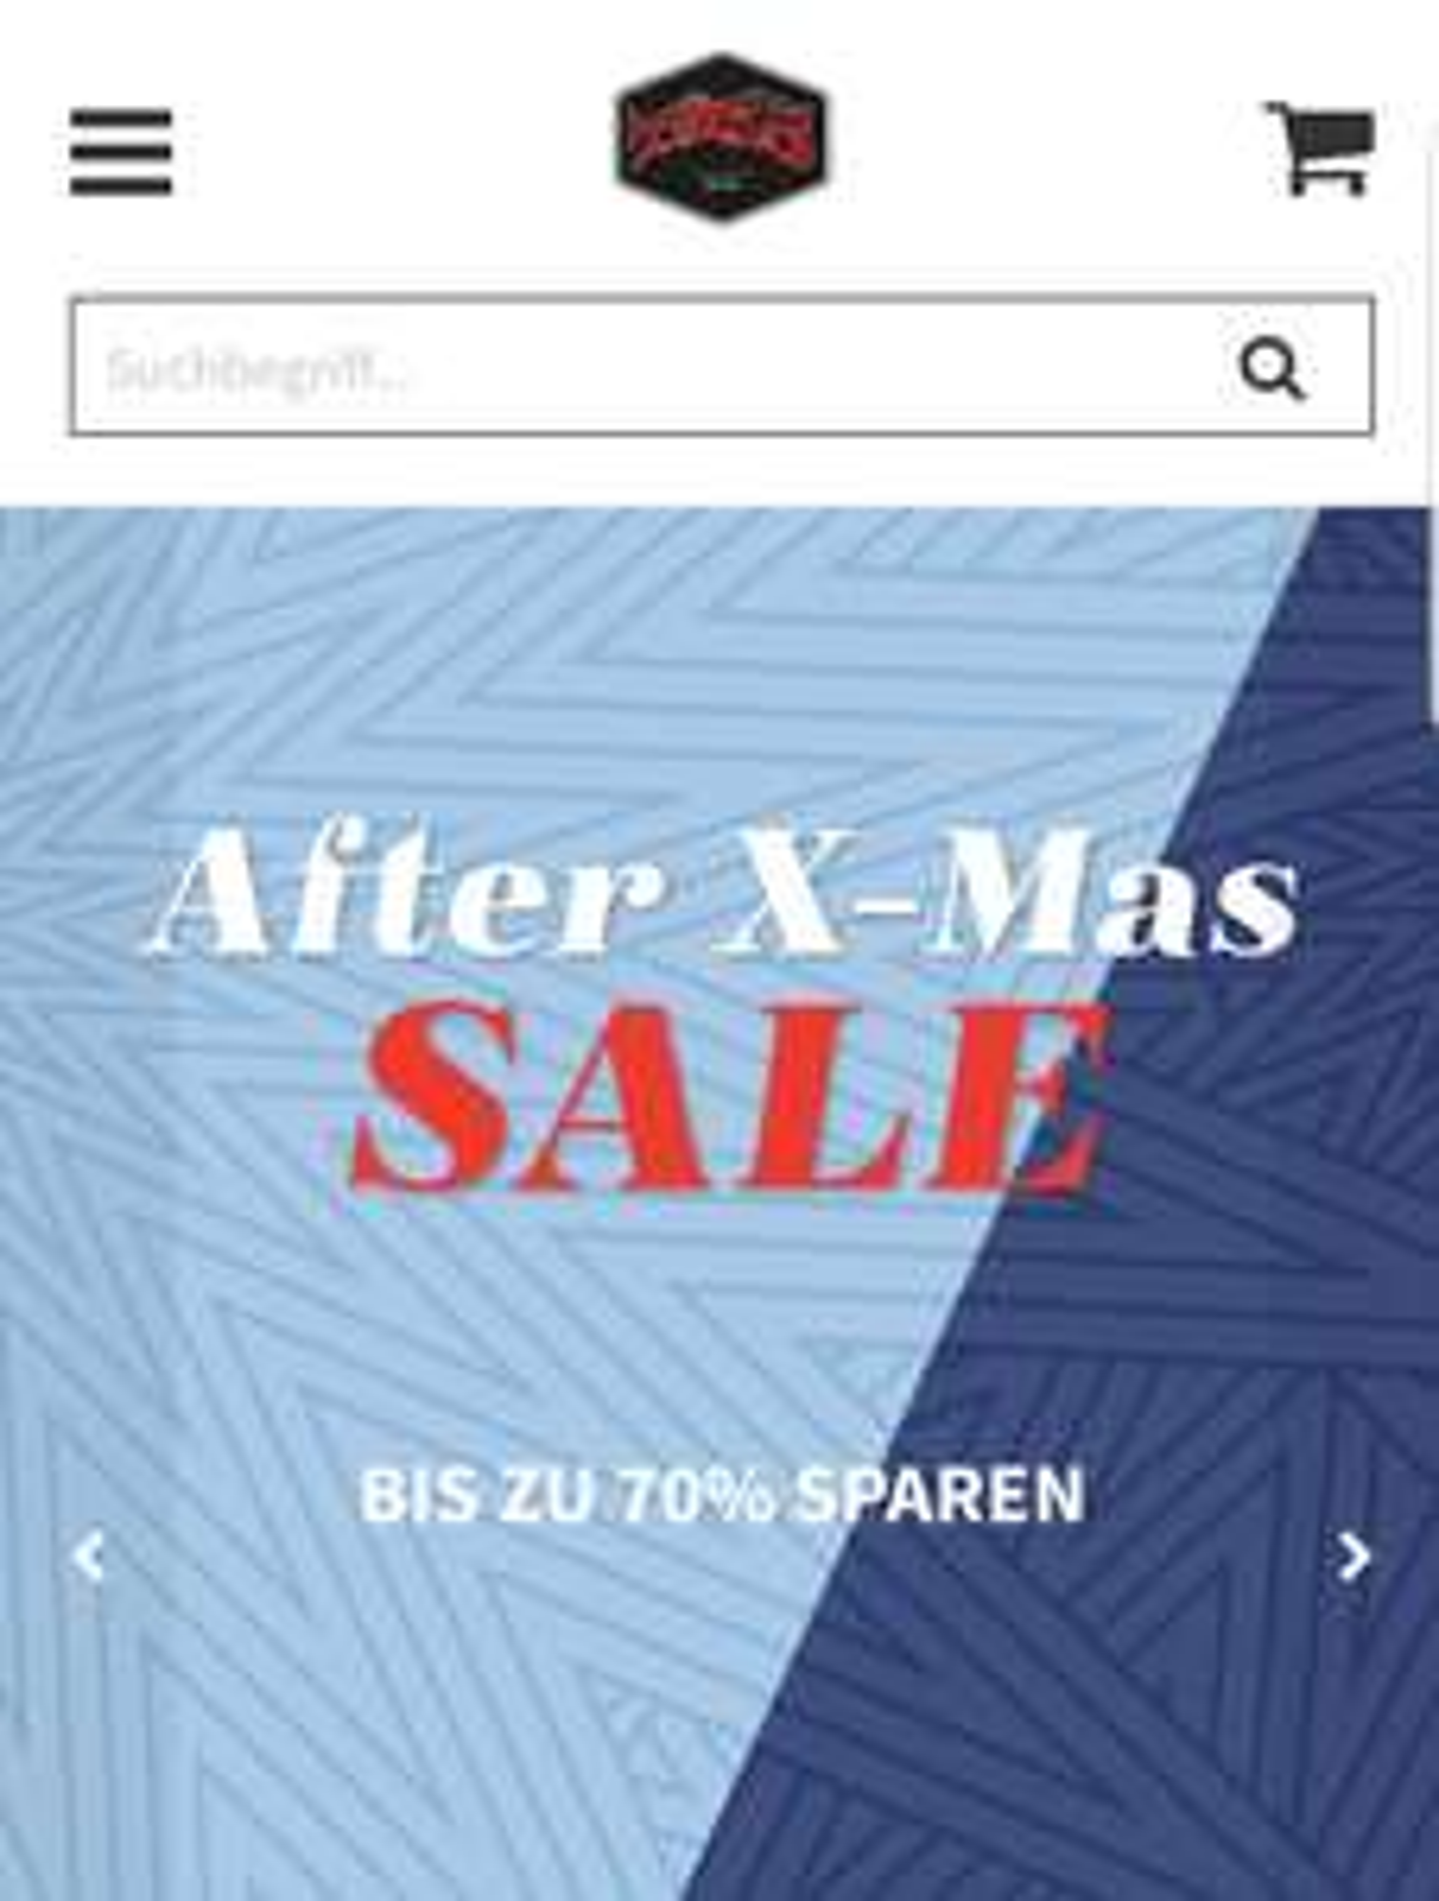 TITUS - After X-Mas Sale - bis zu 70%